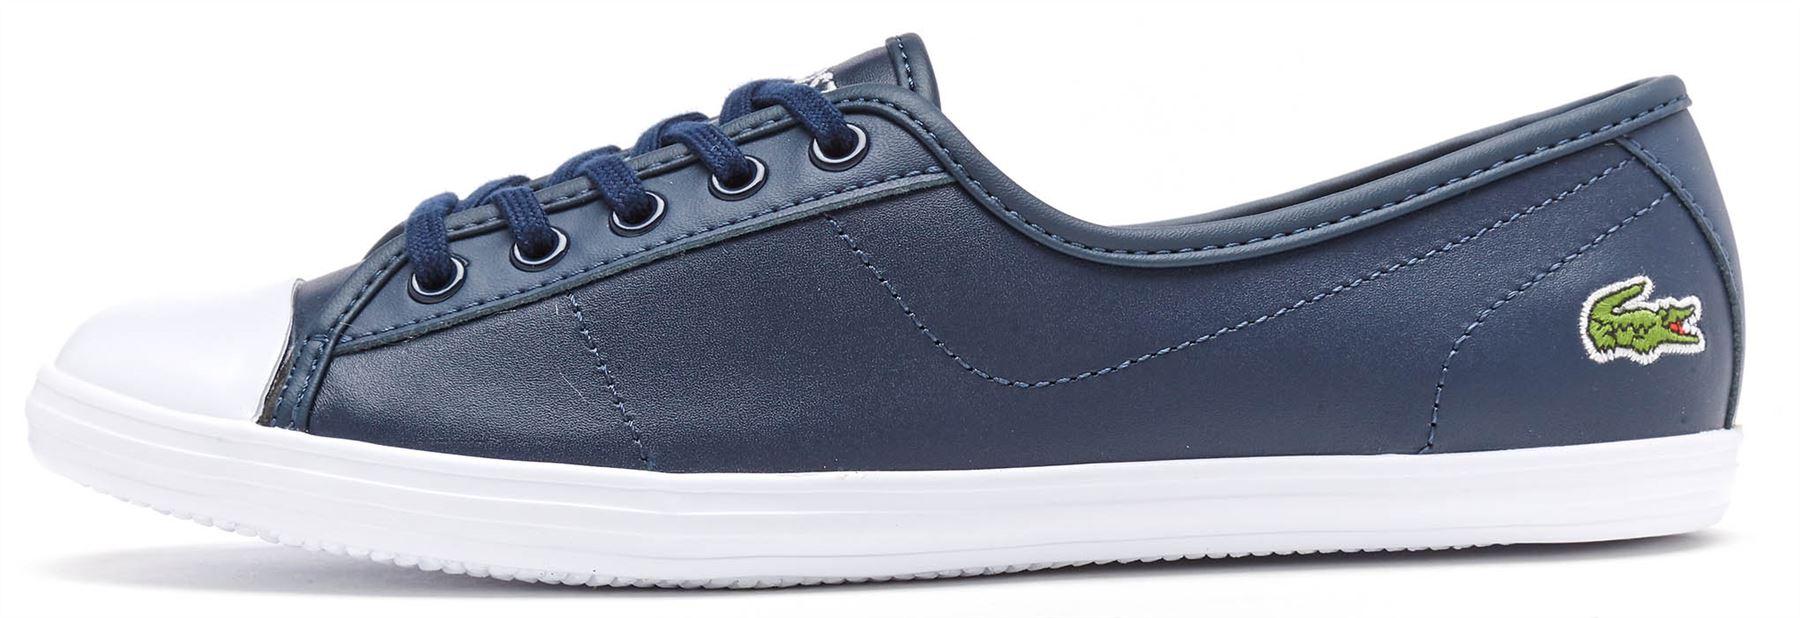 Lacoste ZIANE CHUNKY Lona & Cuero Resbalón en Zapatillas Zapatillas Zapatillas en Negro, blanco y azul marino 569256